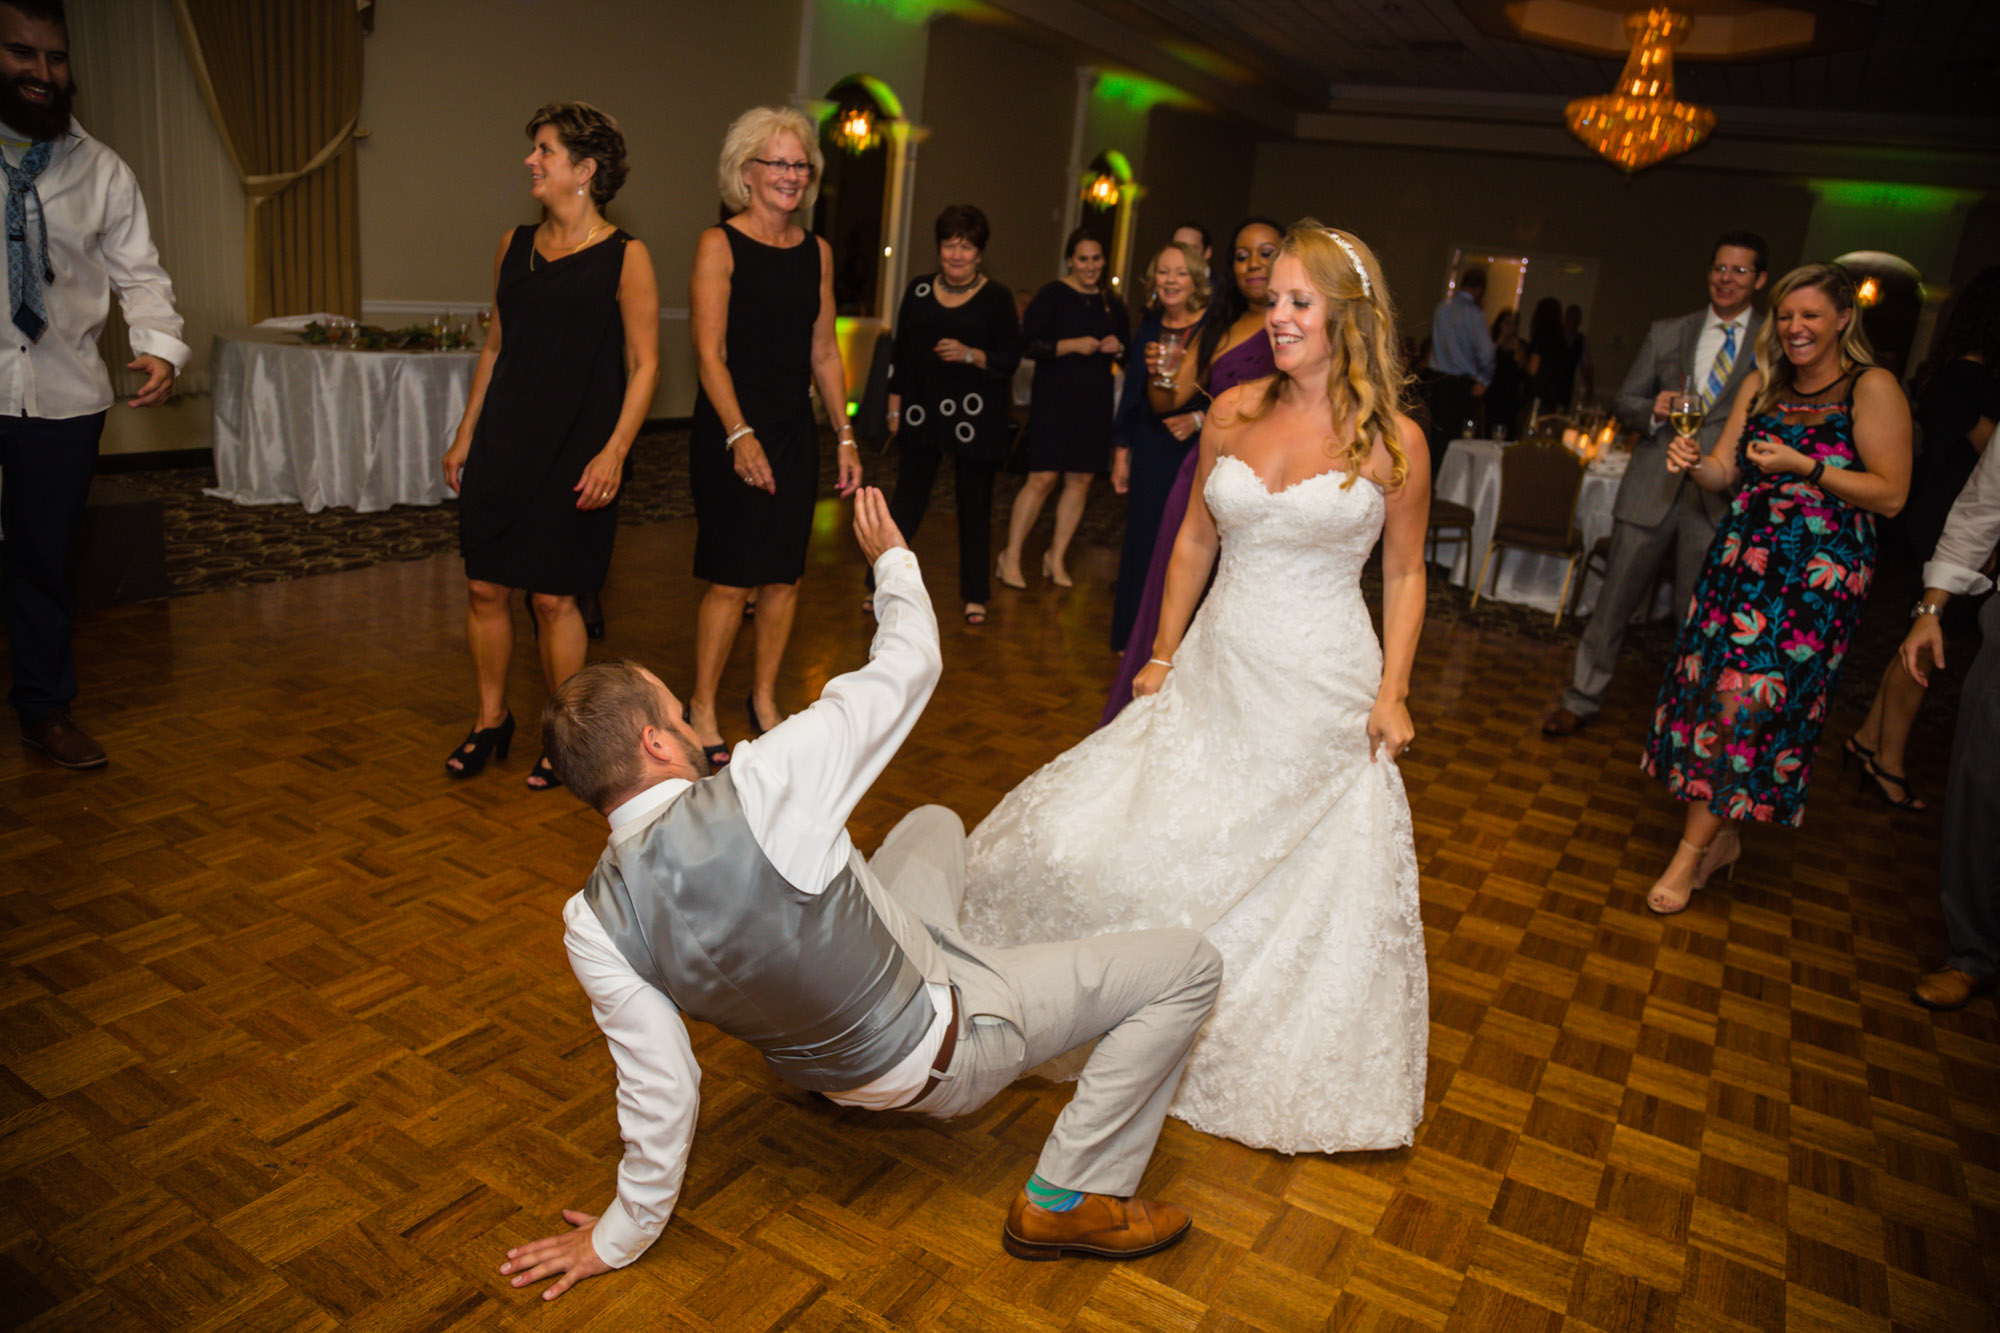 scranton_wedding_photographer_lettieri_pa (45 of 47).jpg